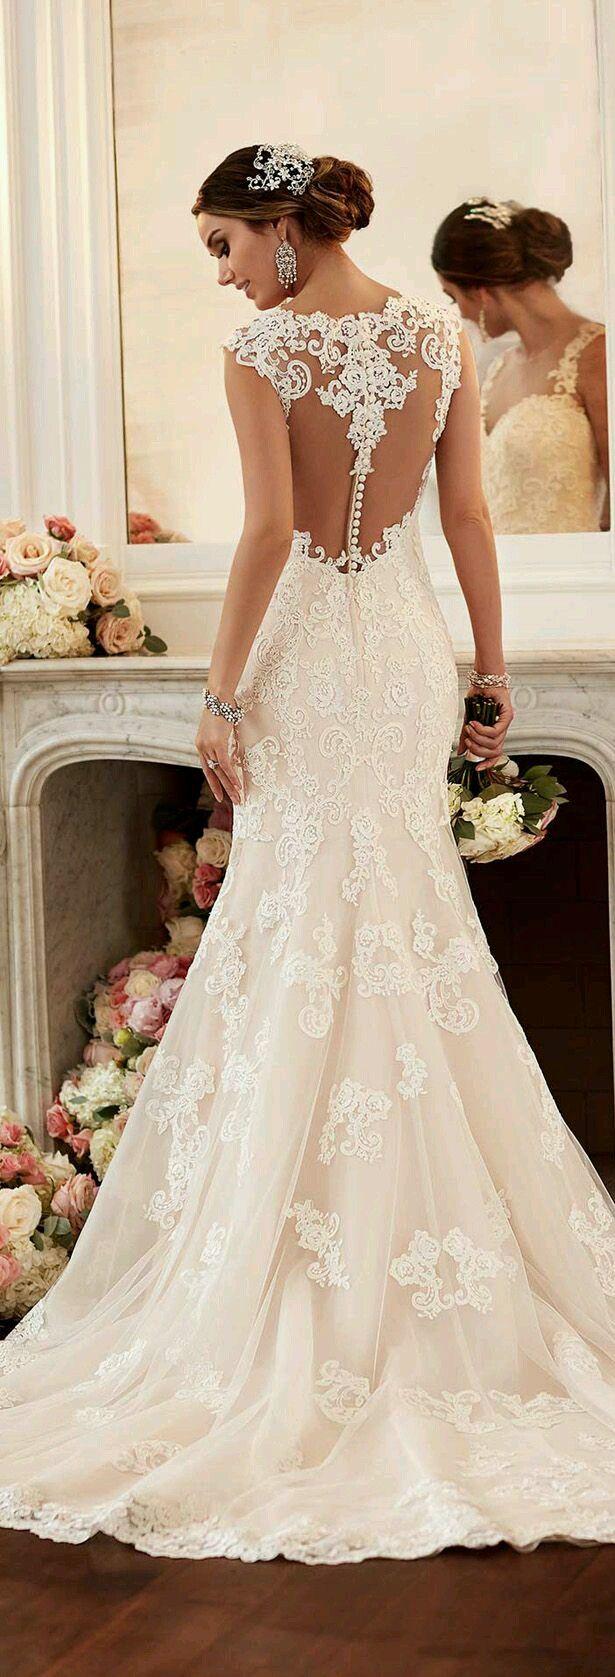 Lace dress roblox  Pin by Laurel Tornes on Wedding Dresses  Pinterest  Wedding dress